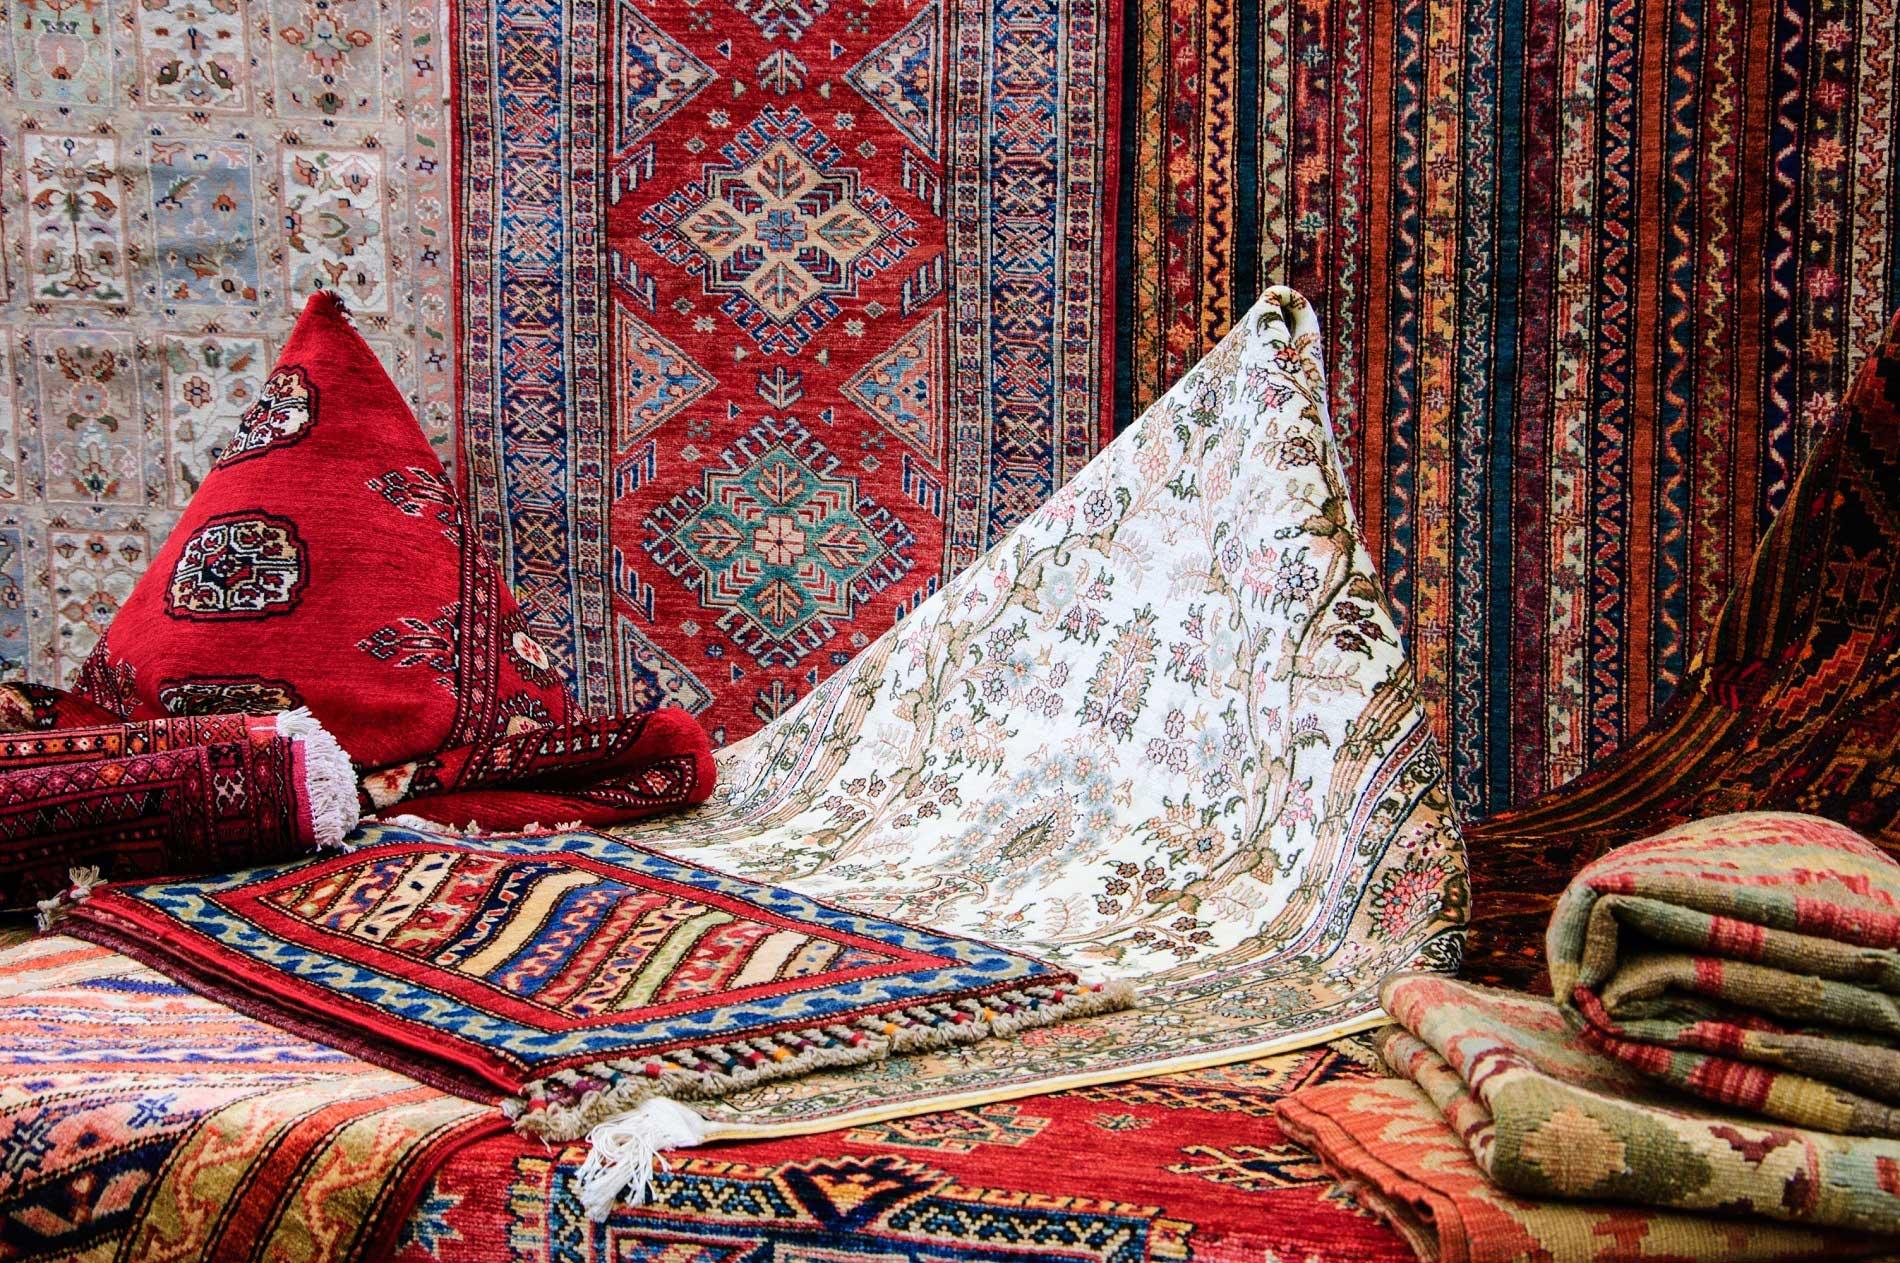 Tappeti artigianali persiani